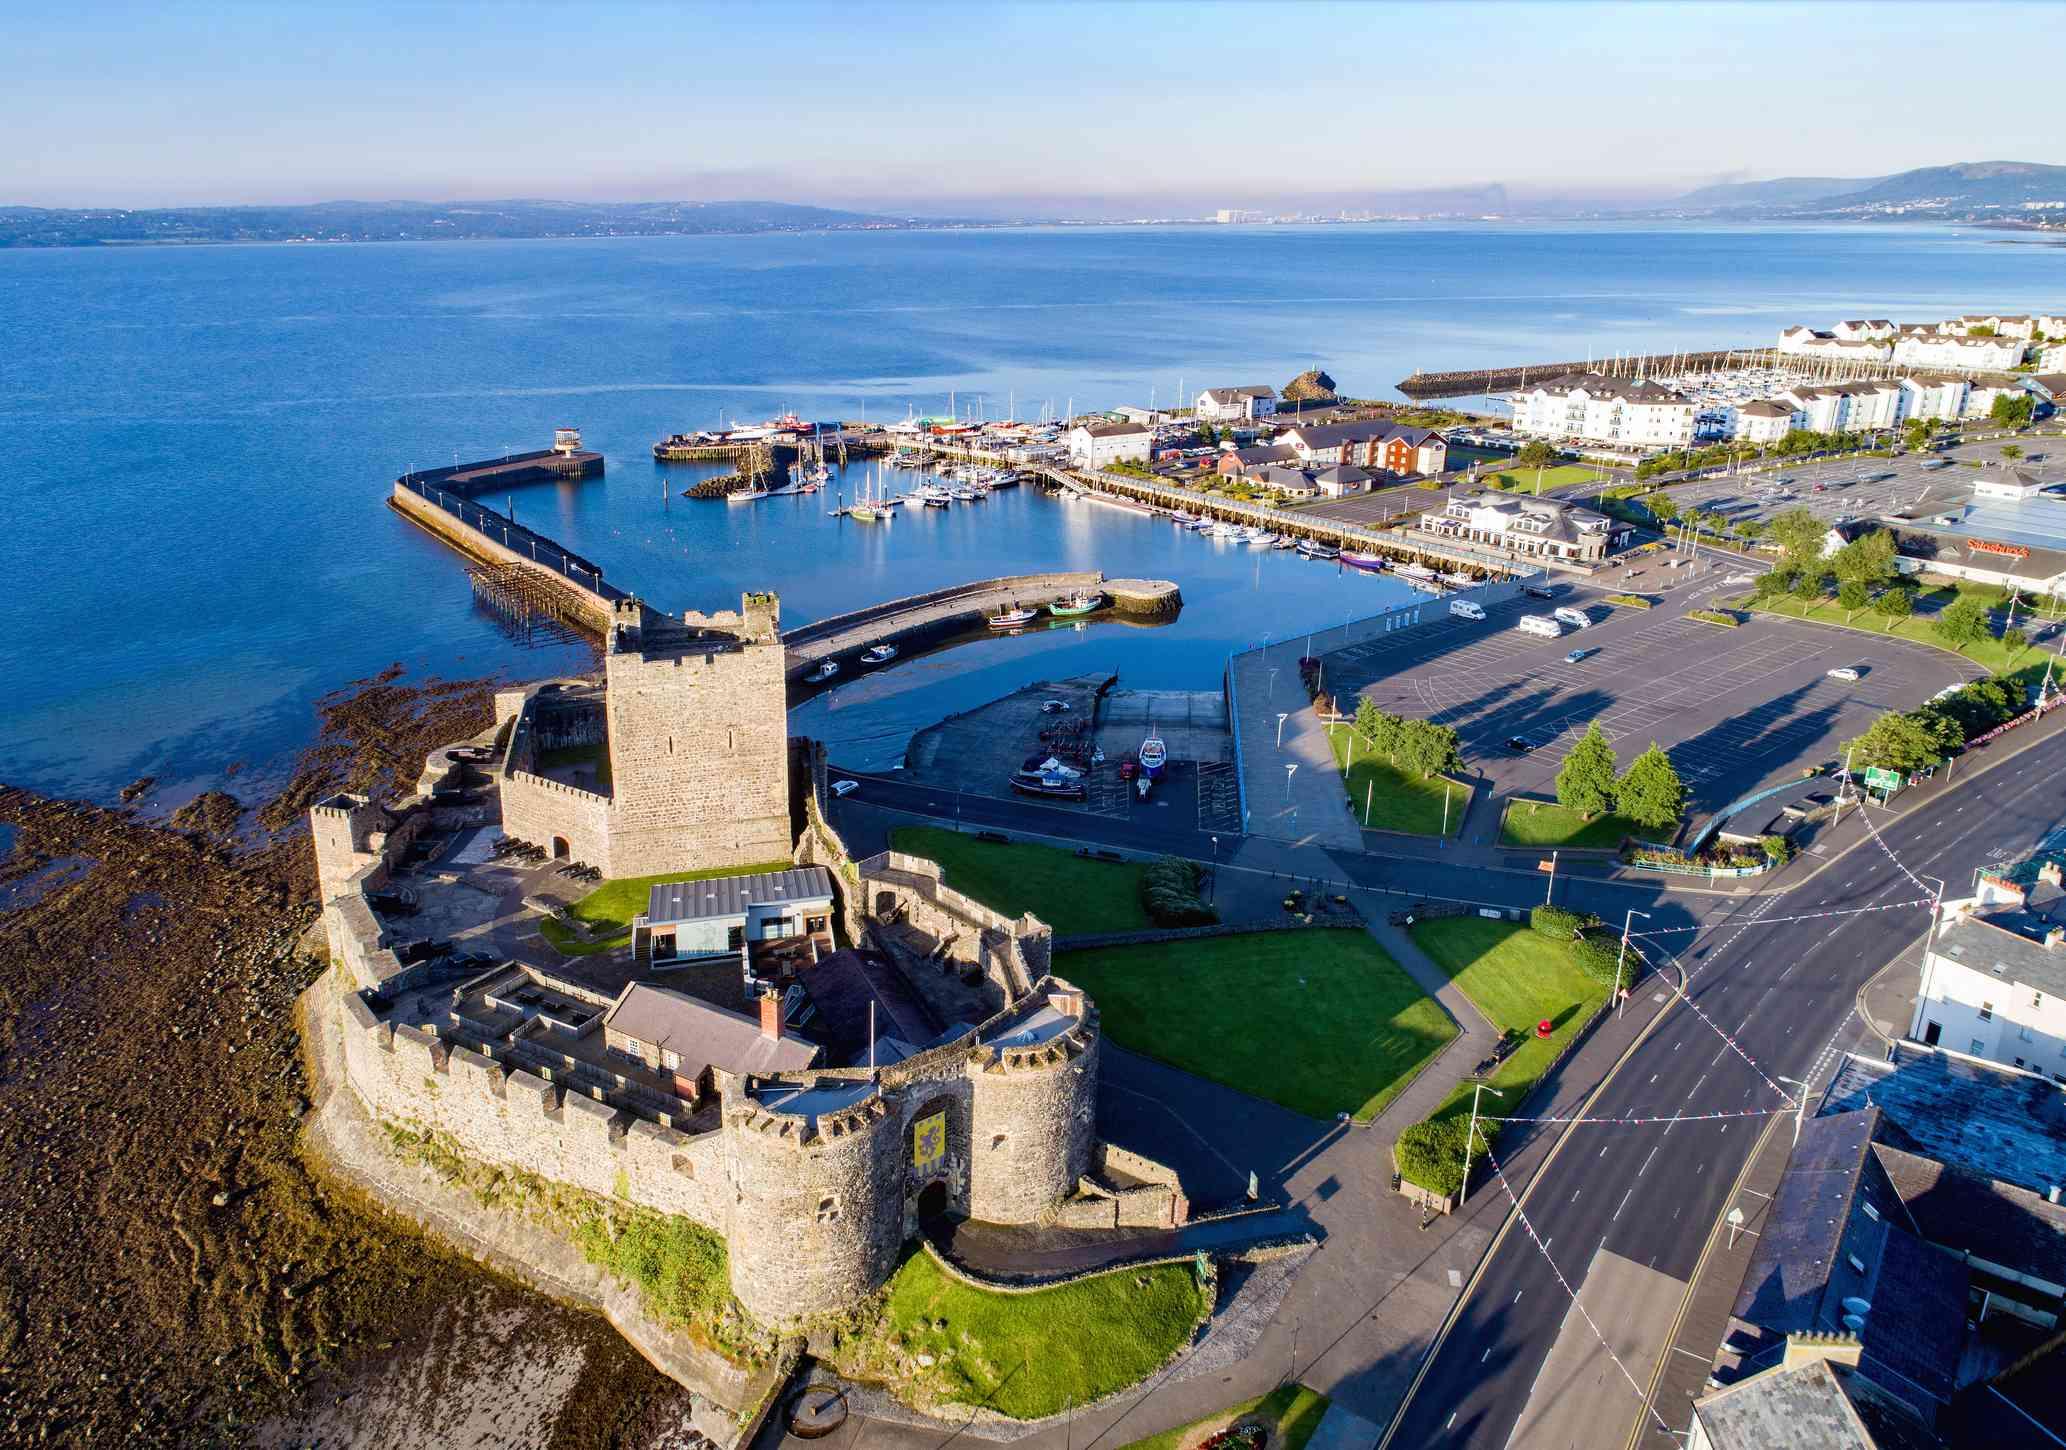 Castle and marina in Carrickfergus, Northern Ireland, UK